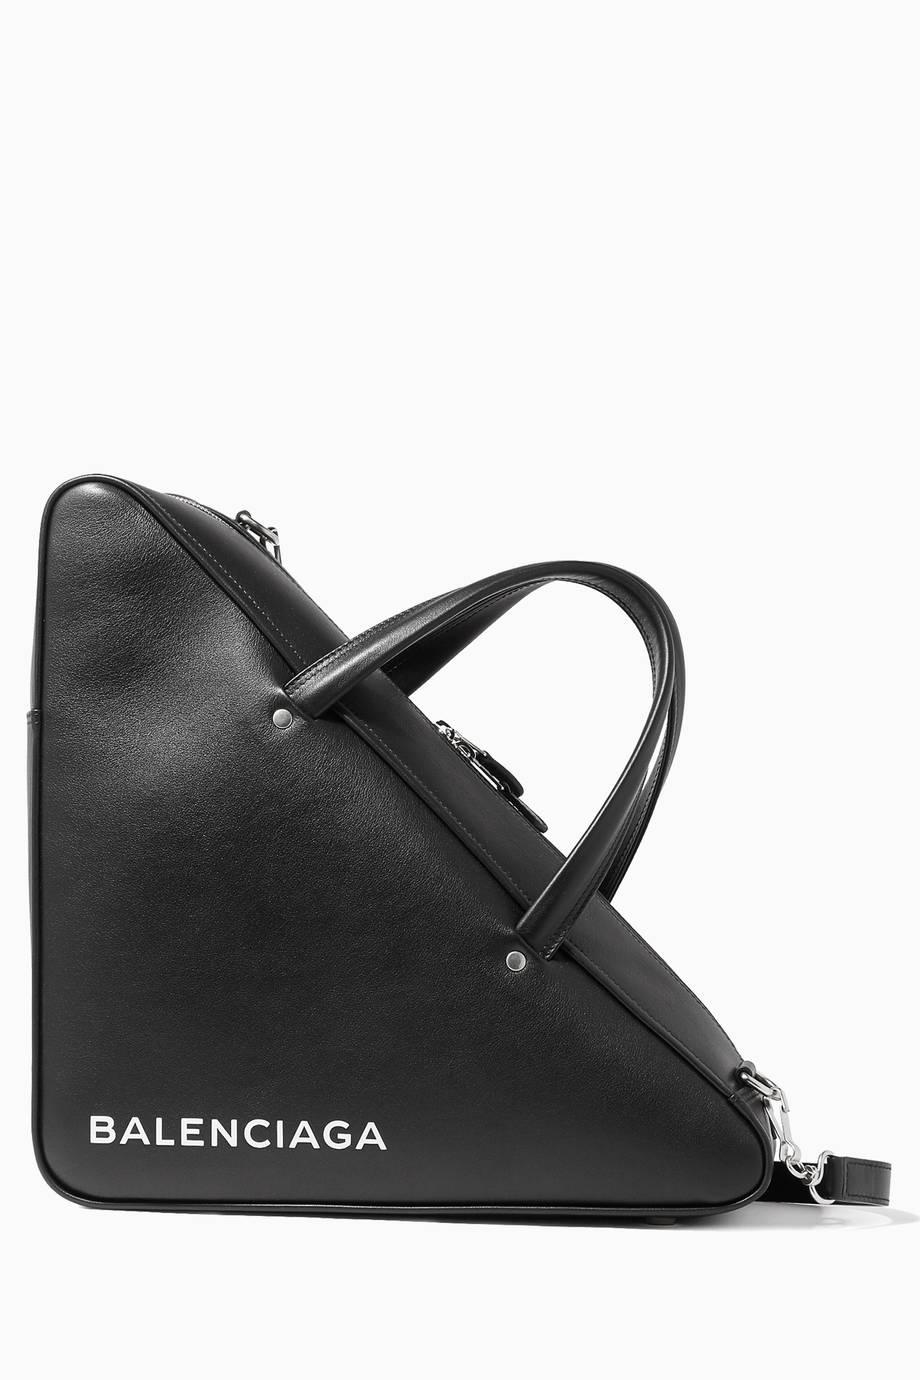 42e2fbc342 Shop Luxury Balenciaga Black Medium Triangle Duffle Bag